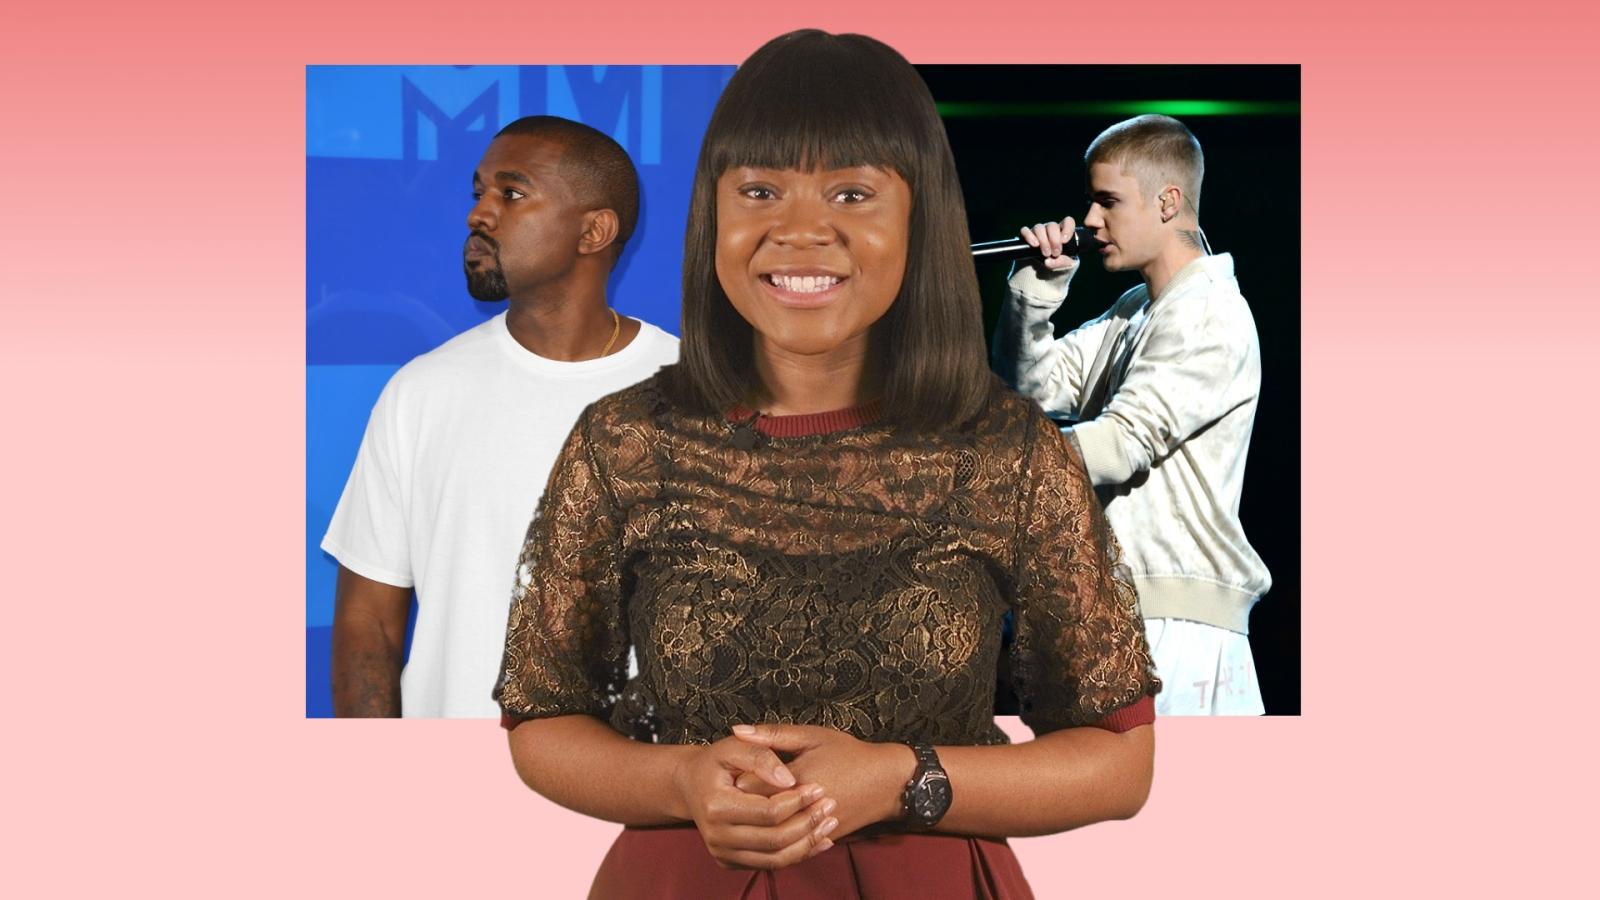 A-list Insider: Kanye West hospitalised, Justin Bieber attacks fan, Prince Harry's honeymoon proposal